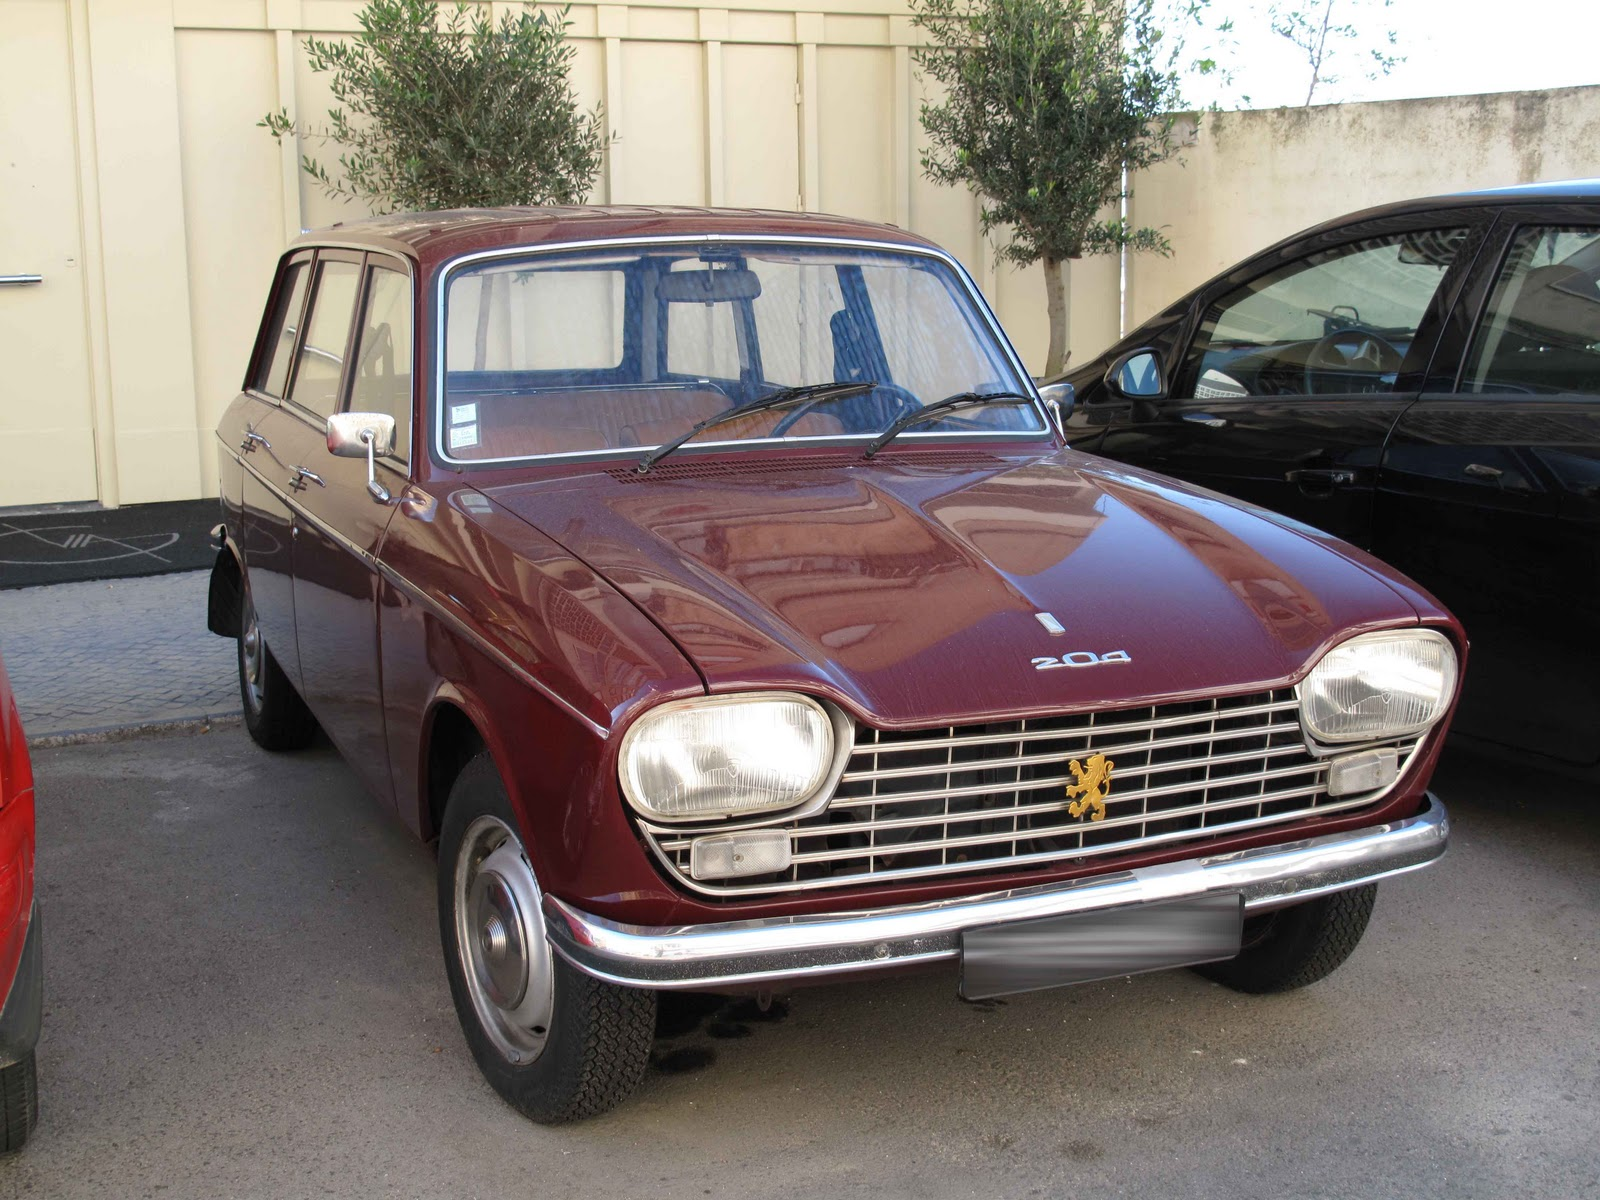 peugeot, 204, Cars, Classic, French, Sedan Wallpapers HD